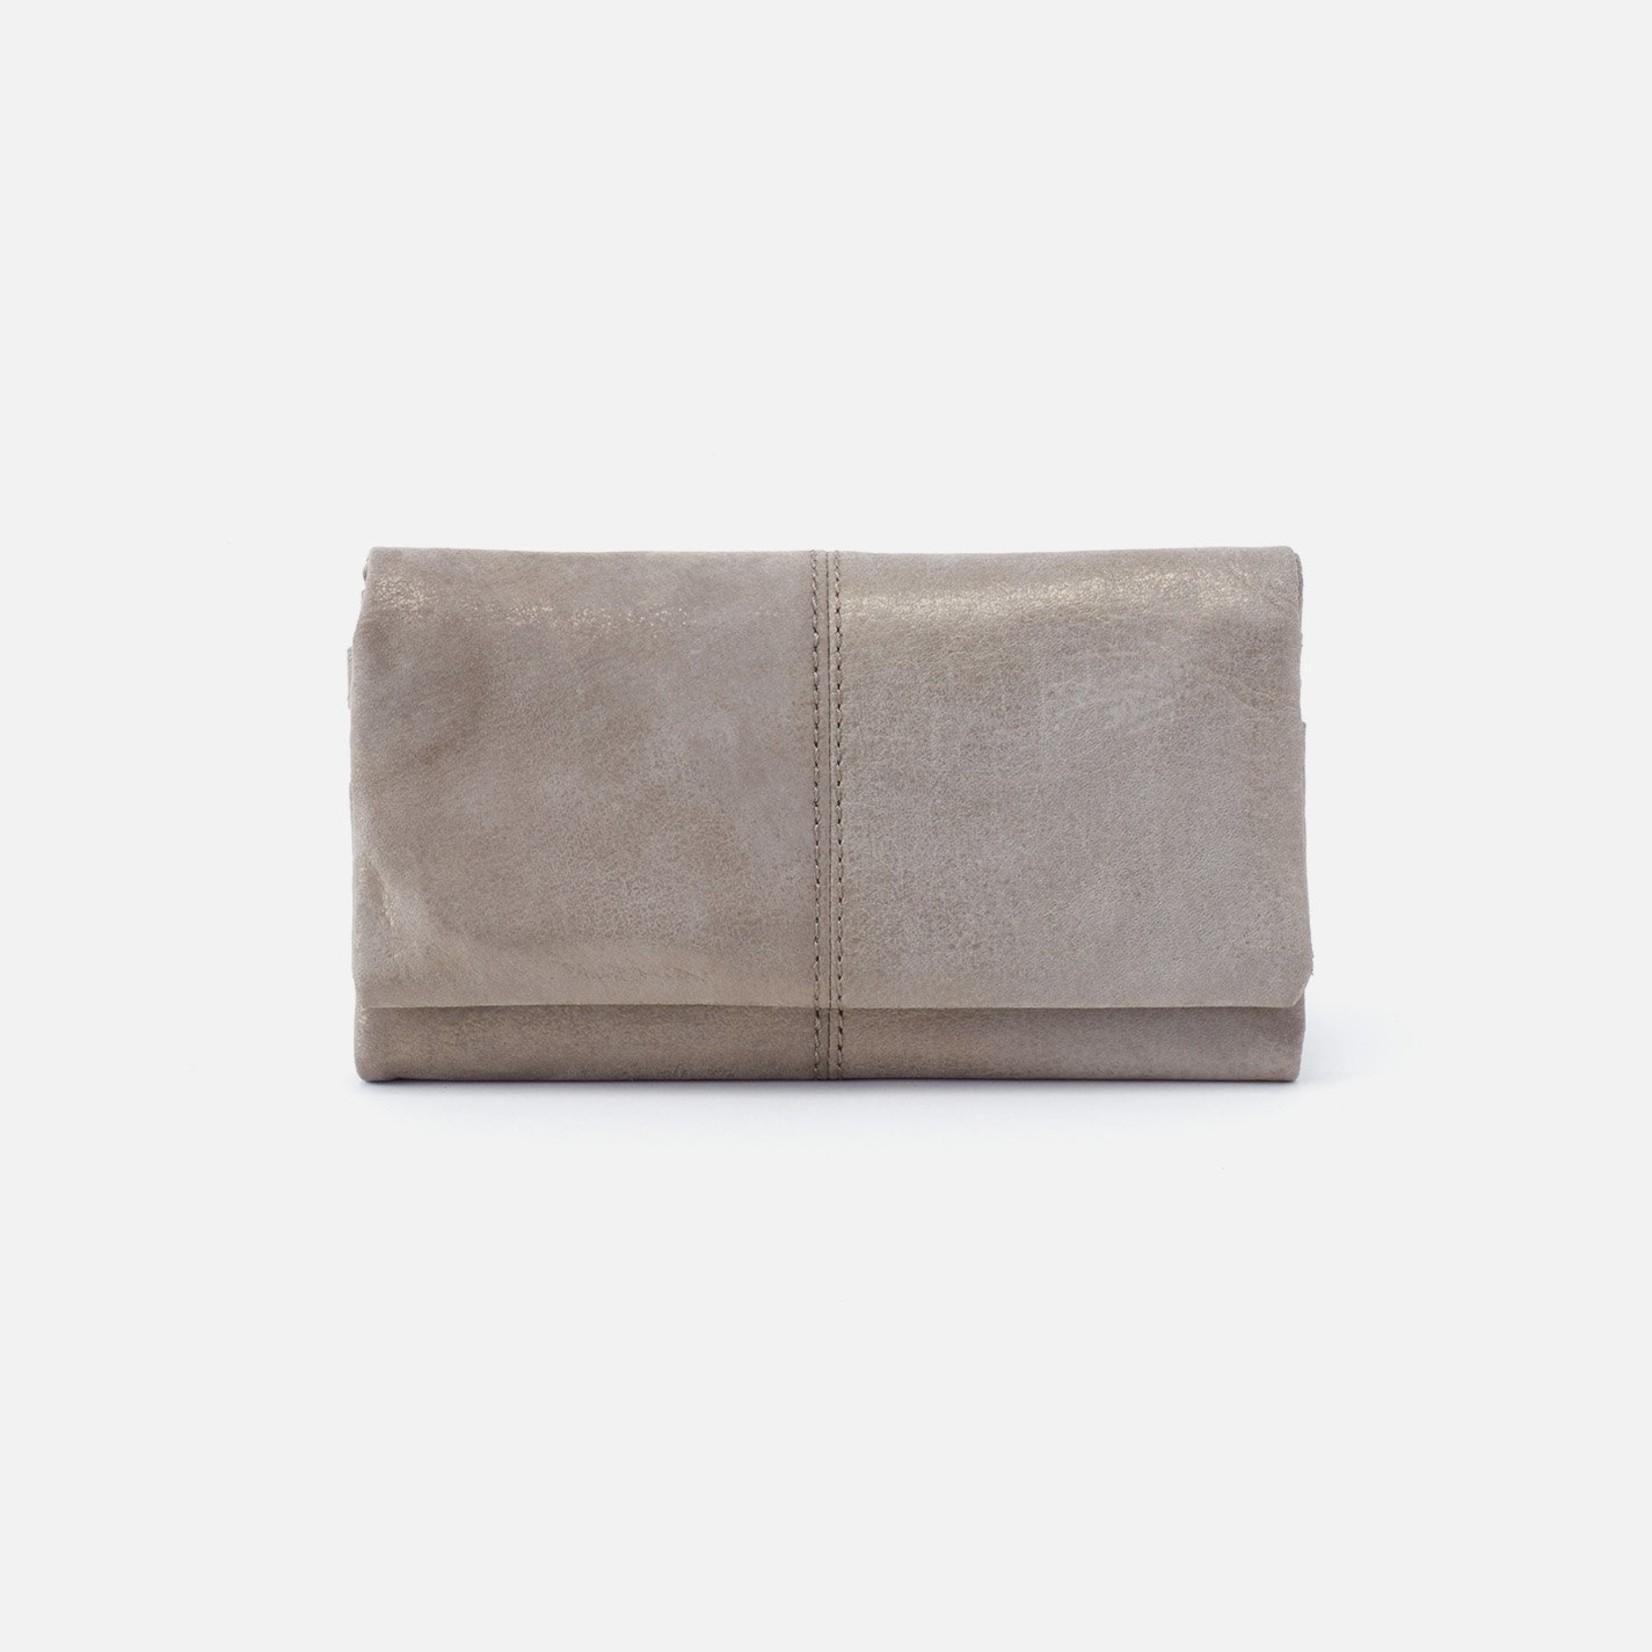 HOBO Bags Keen Wallet Granite Gold